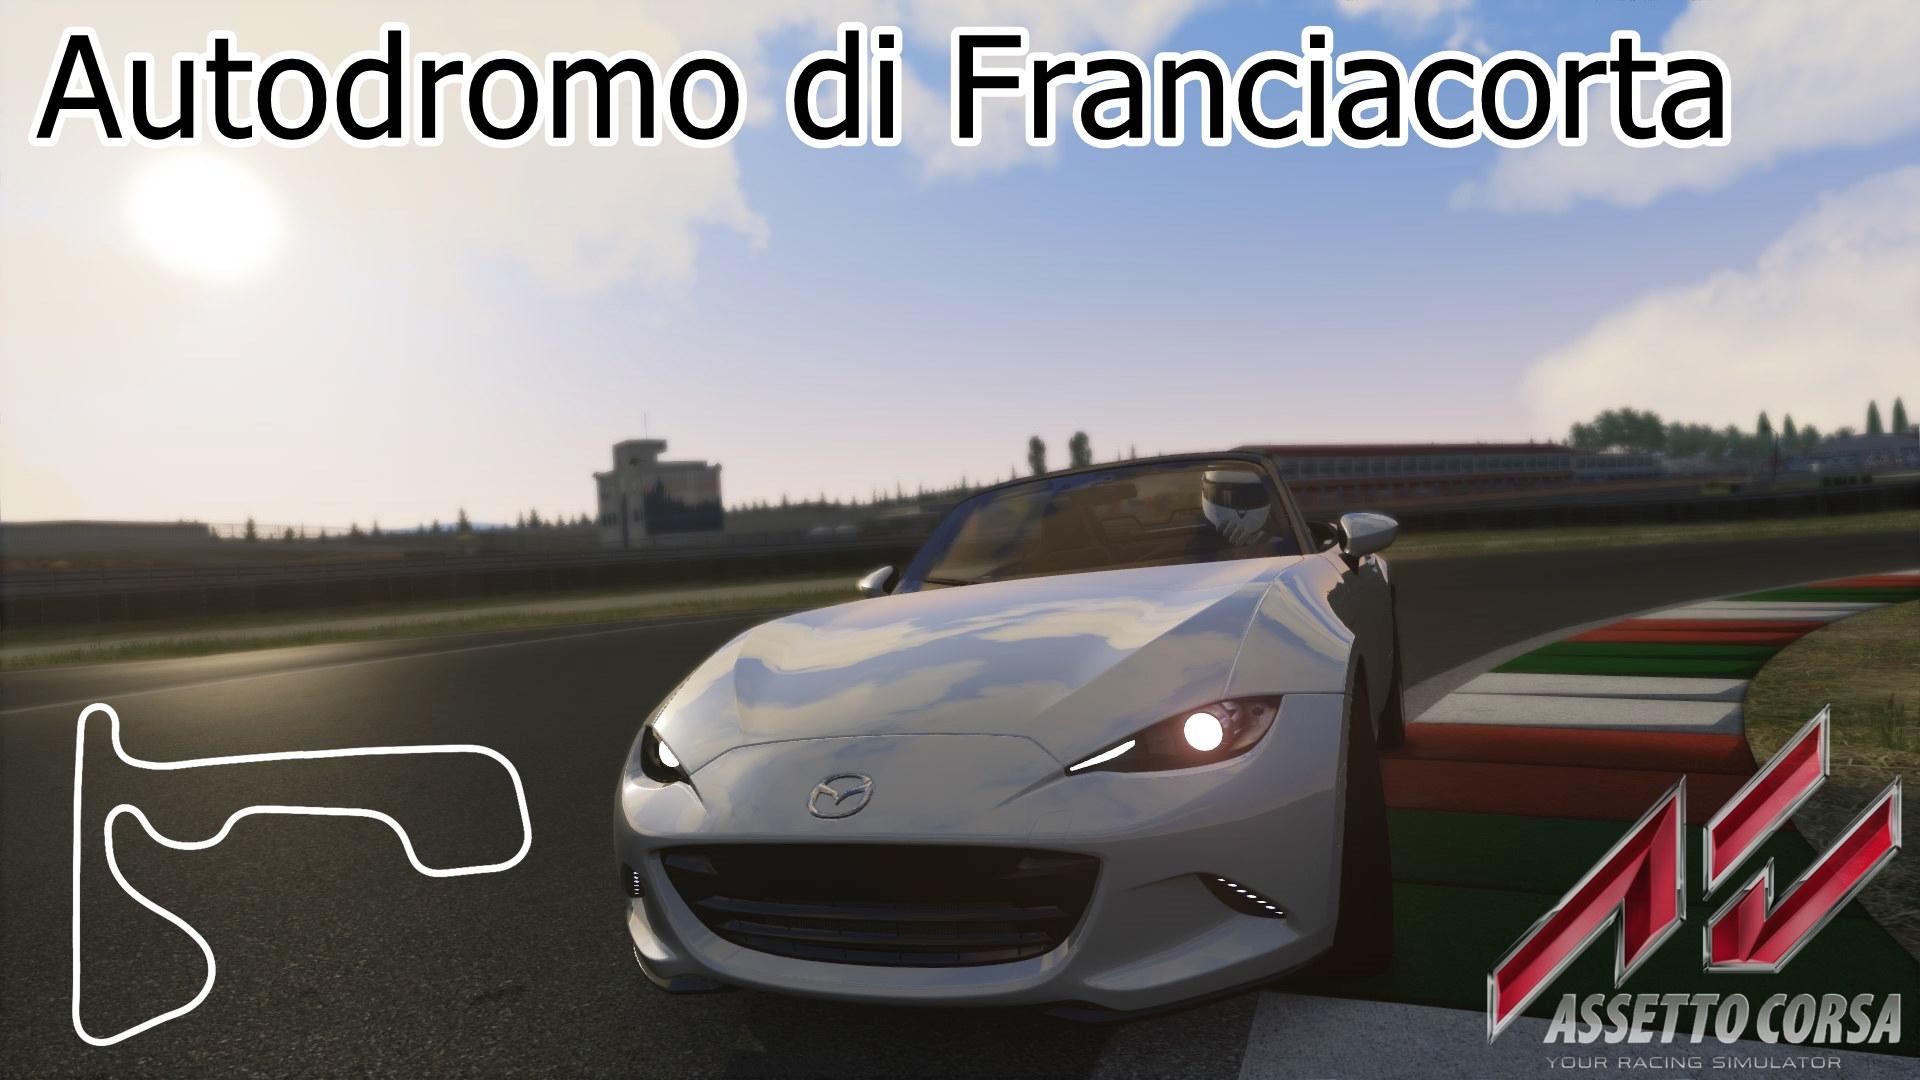 Screenshot_ks_mazda_mx5_nd_autodromo_di_franciacorta_31-5-116-21-26-25.jpg